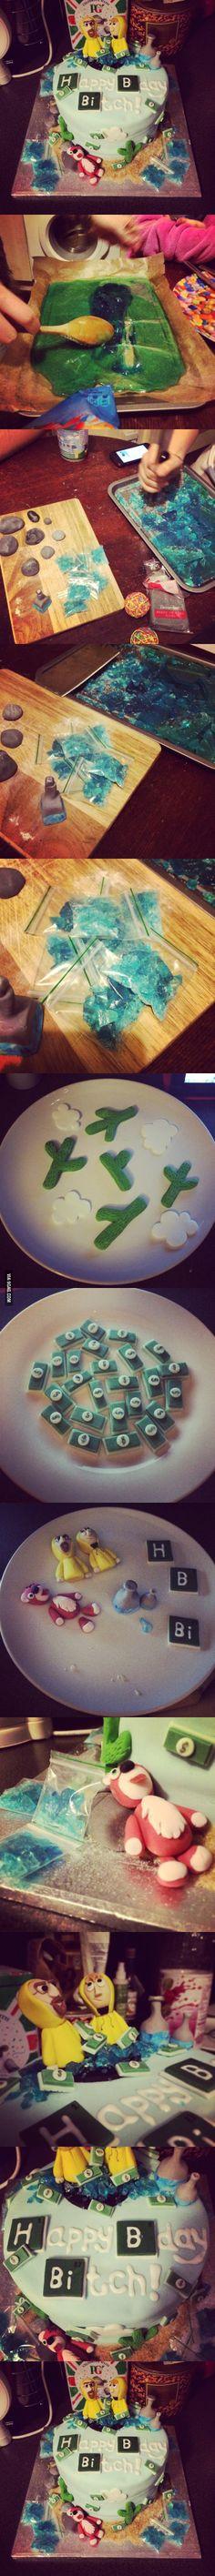 The Best Breaking Bad Cake!